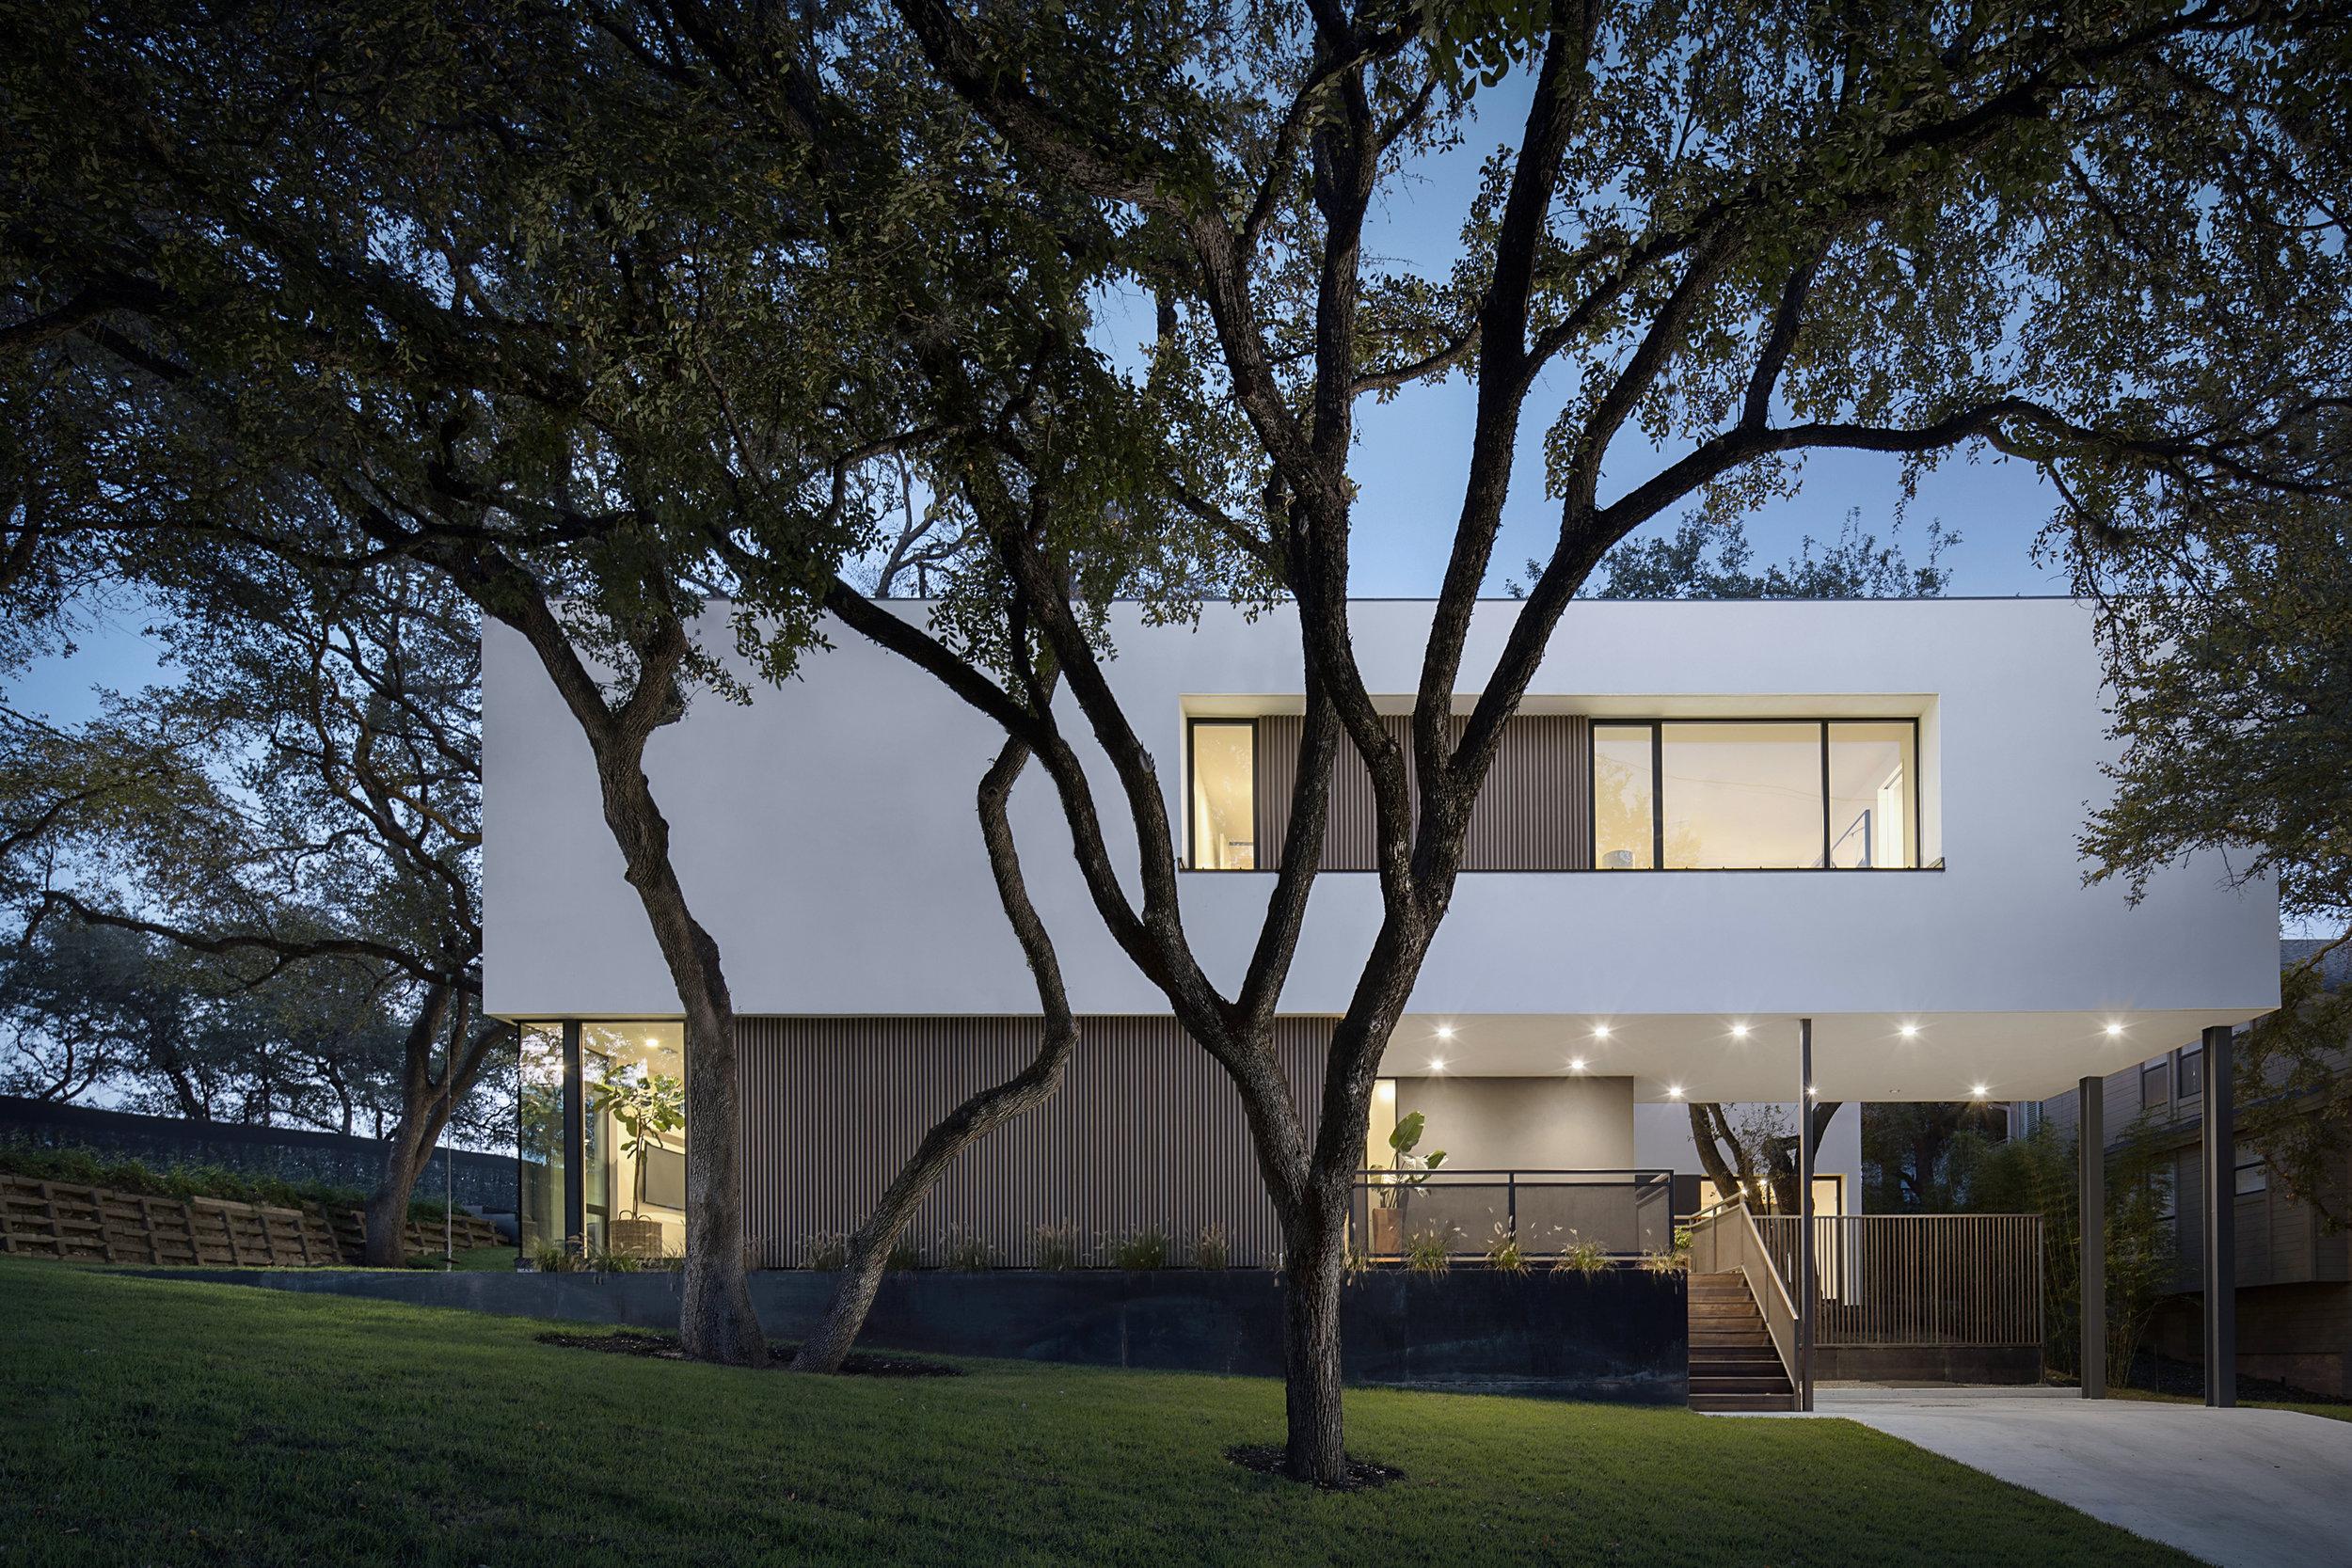 Court Duplex Residence   Alterstudio / Becky Fuller Homes  Austin, TX  © Jonathan Dean